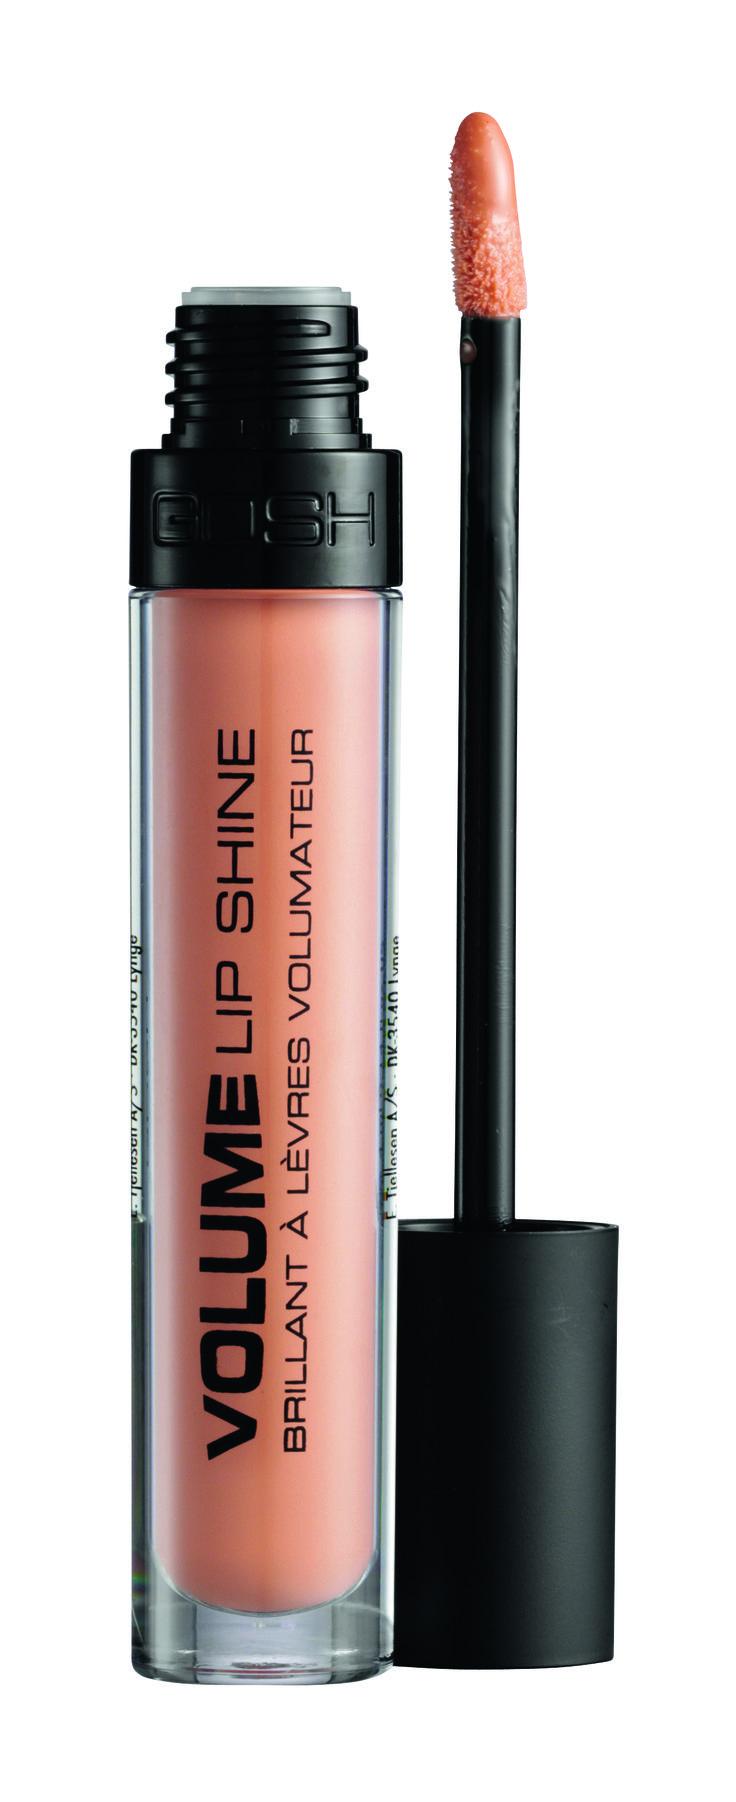 Gosh Volume Lip Shine 08 Nude